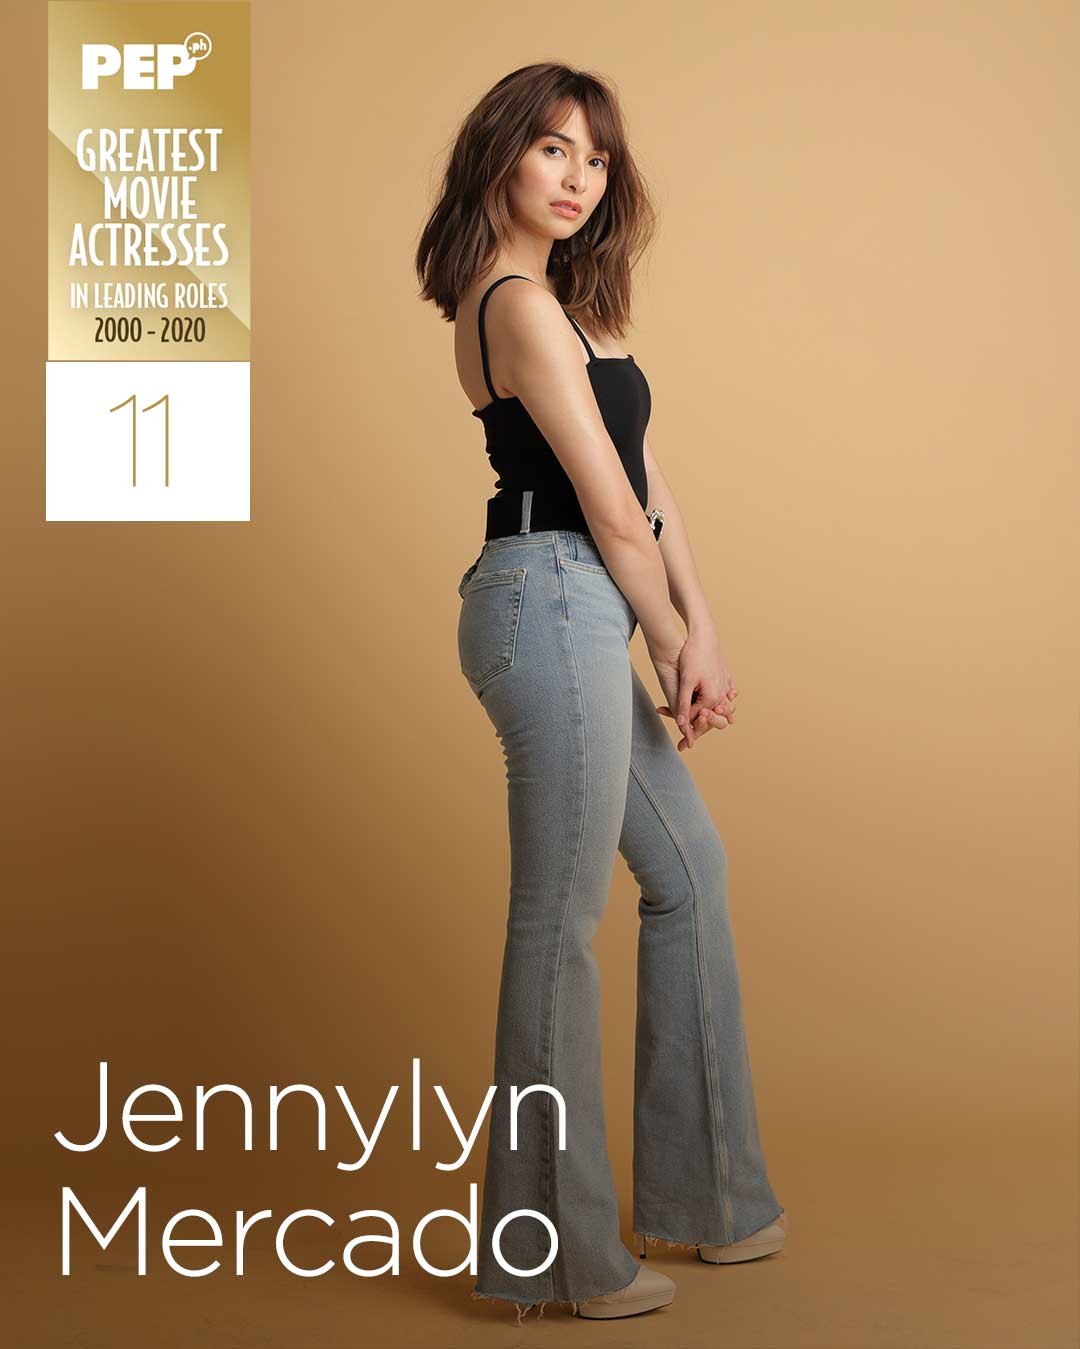 Jennylyn Mercado, 15 Greatest Movie Actresses